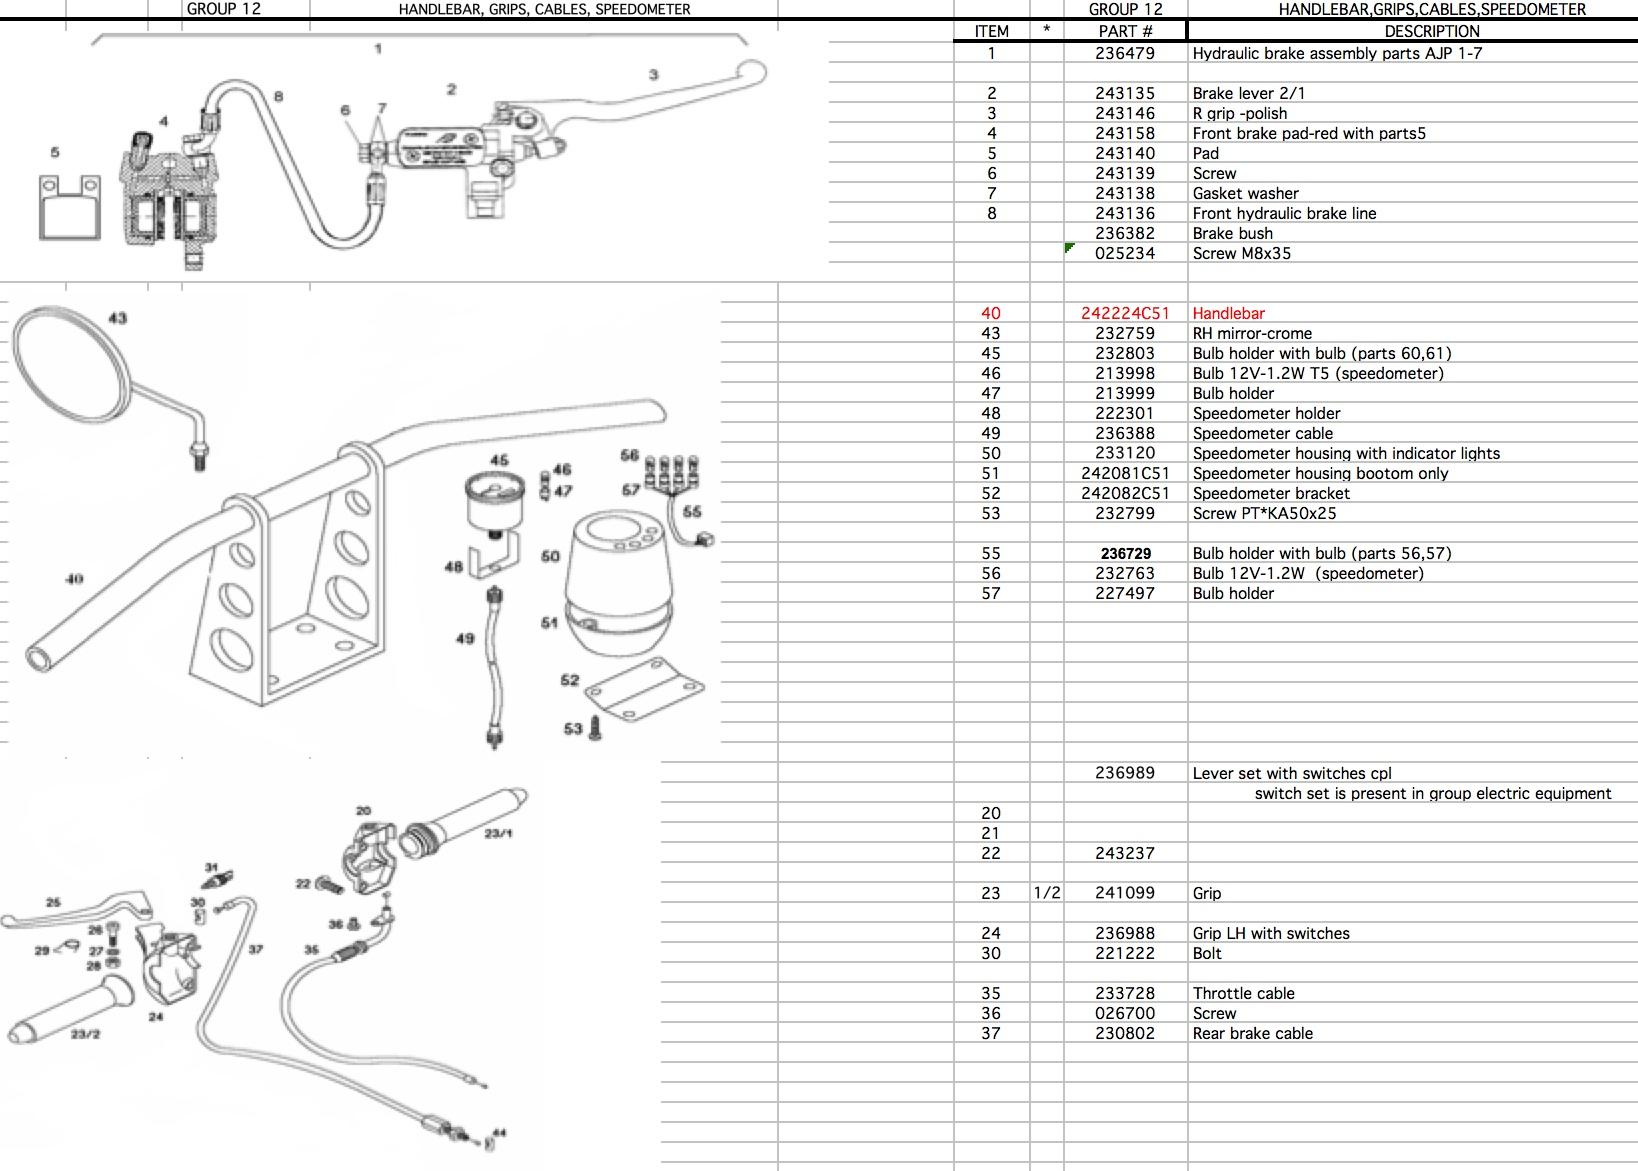 group12  u0026quot handlebars  grips  cables  speedometer u0026quot